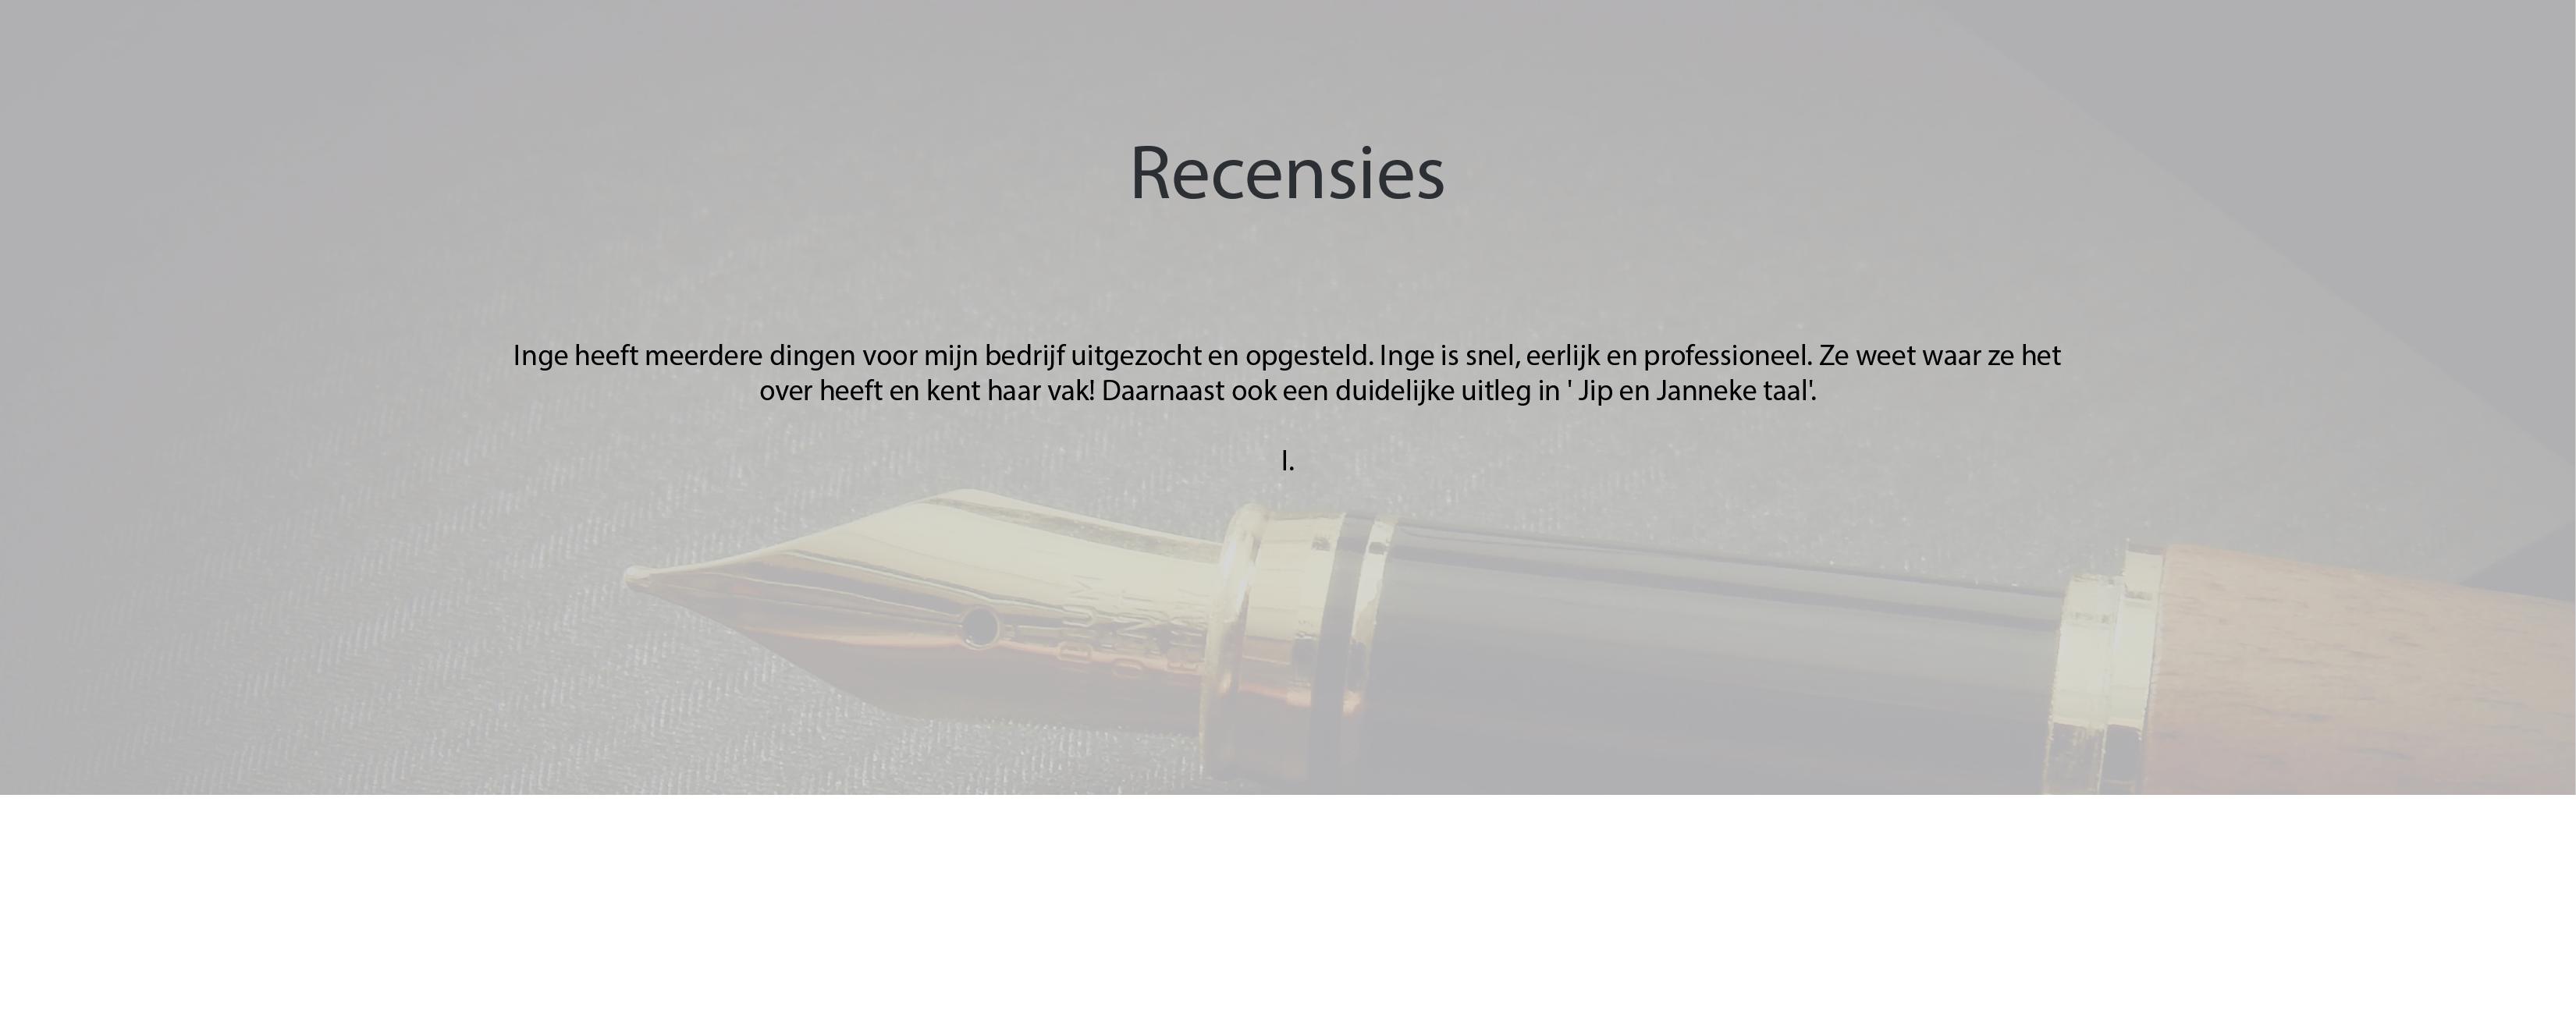 Recensies